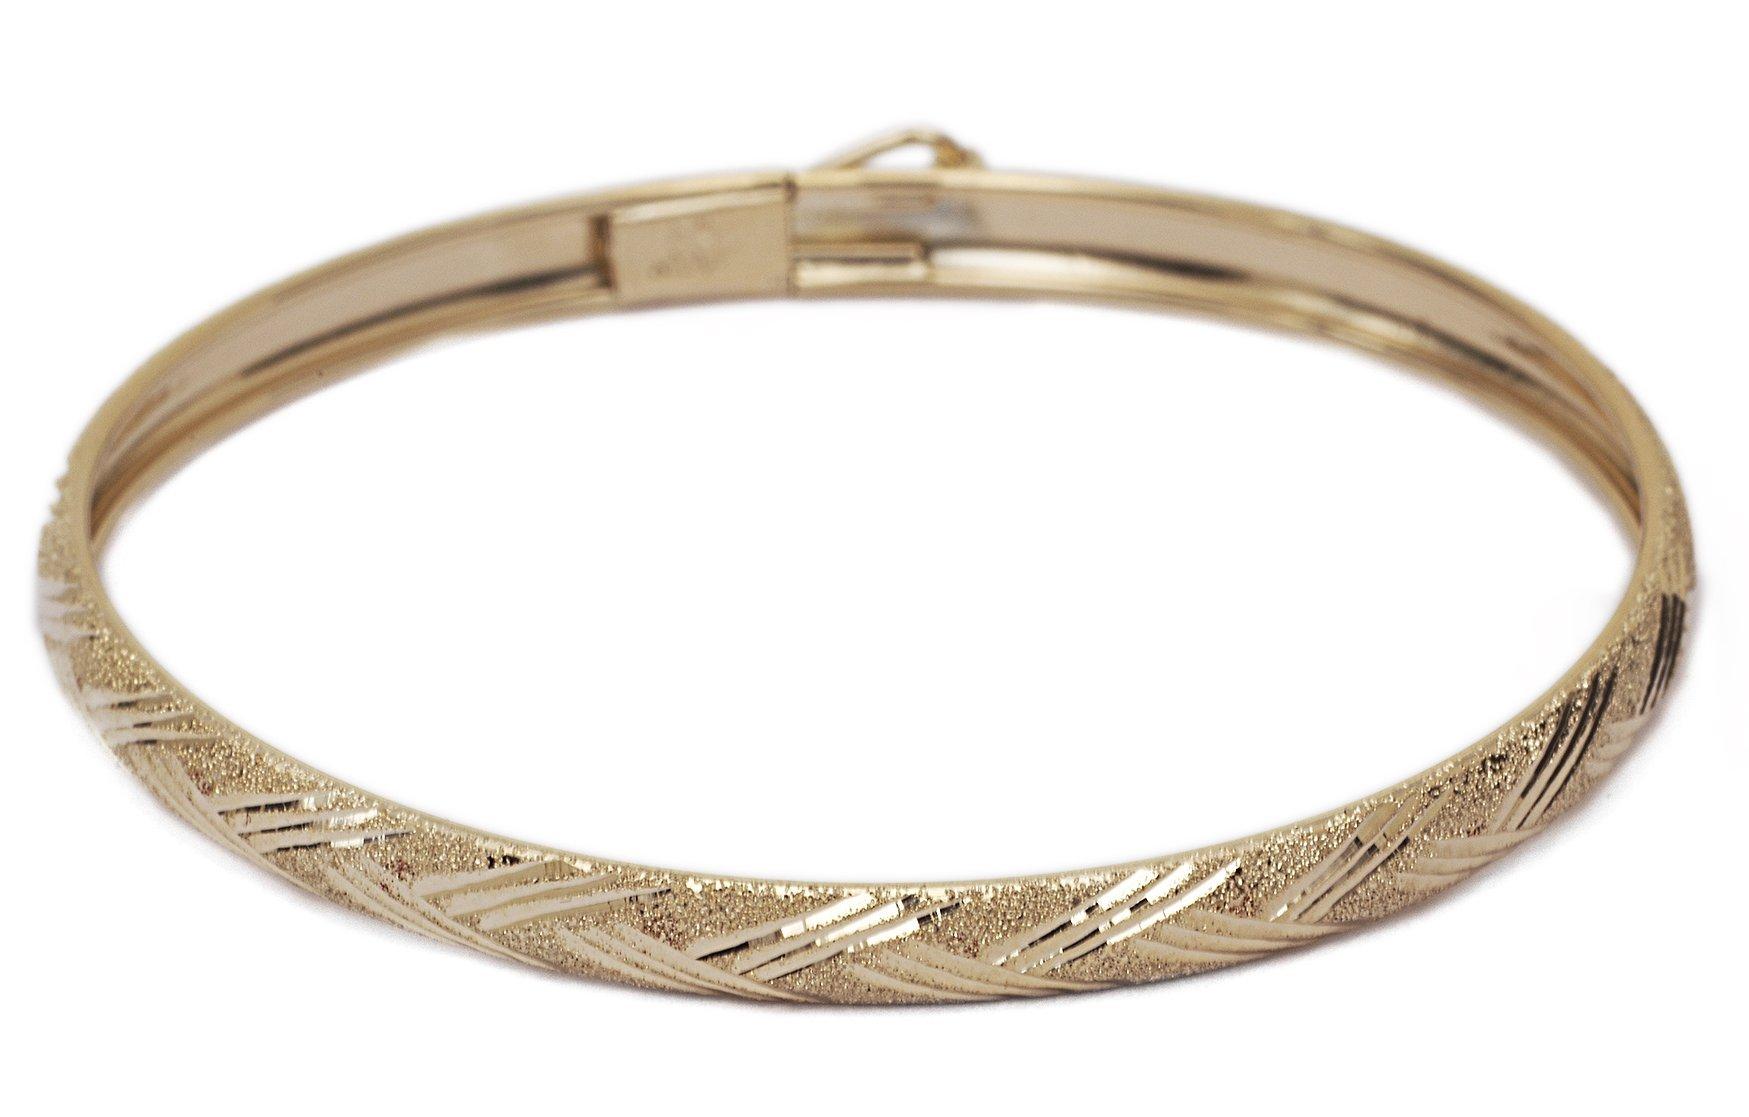 "10k Yellow Gold Kids bangle bracelet Flexible Round with Diamond Cut Design (0.12"")"